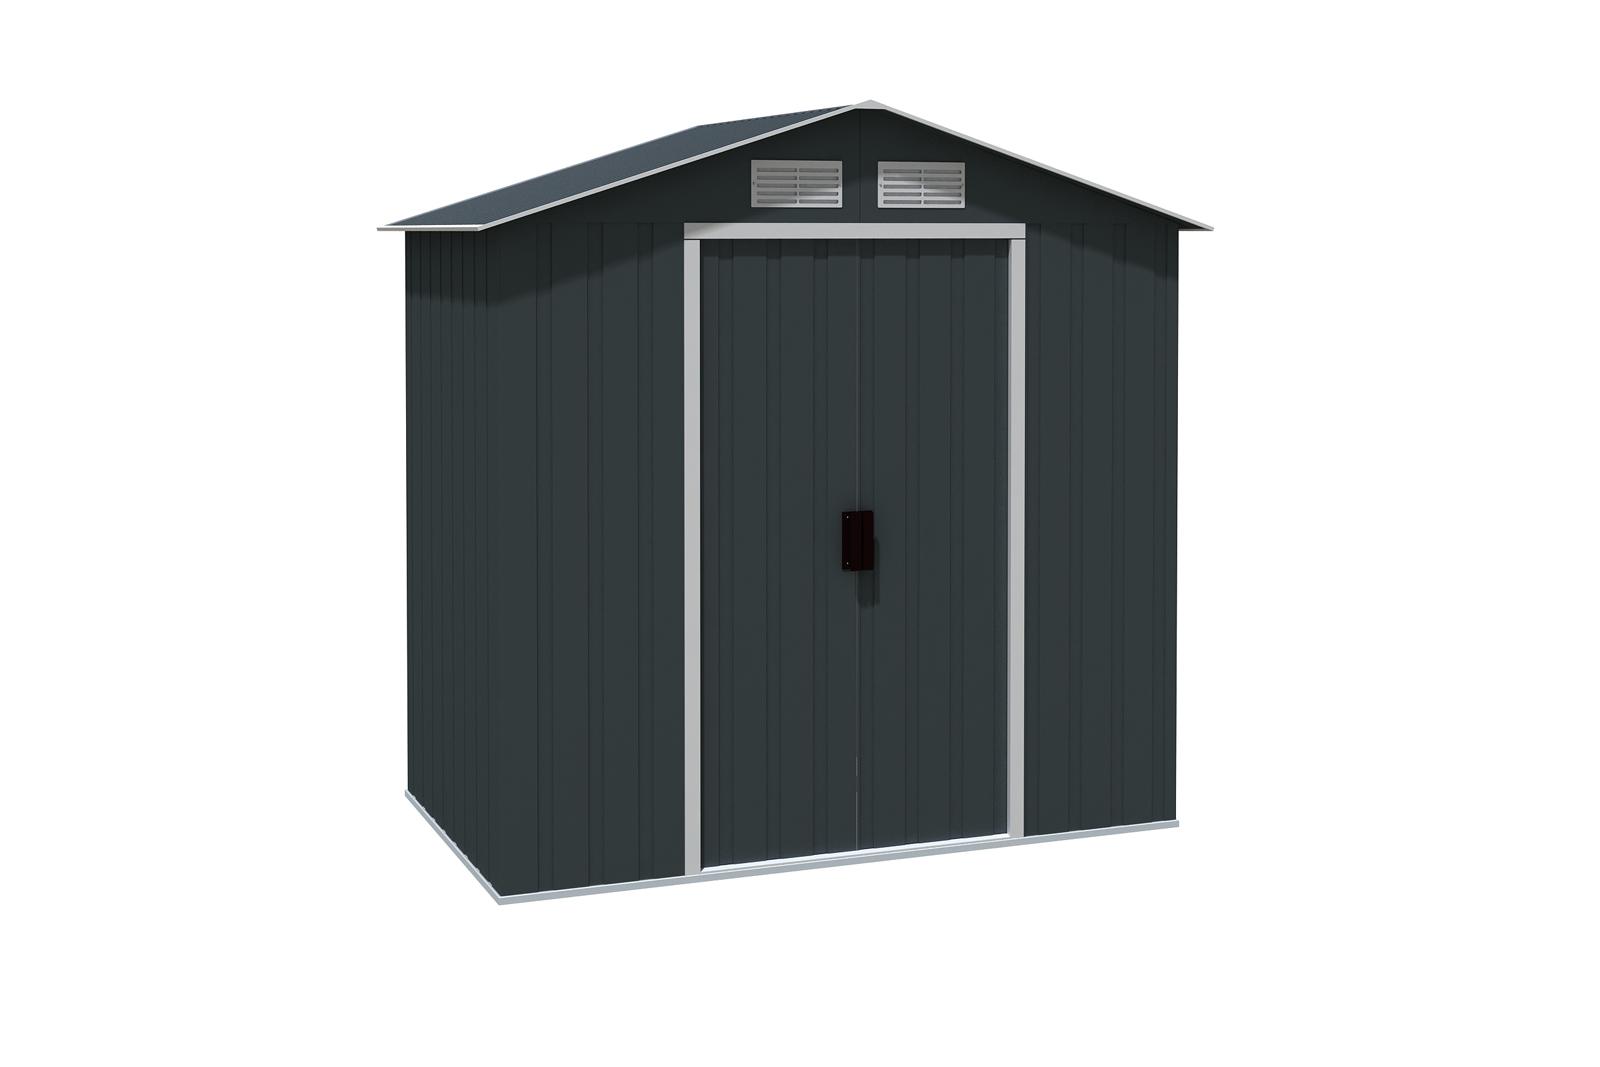 metallger tehaus riverton 6x4 anthrazit 7240. Black Bedroom Furniture Sets. Home Design Ideas